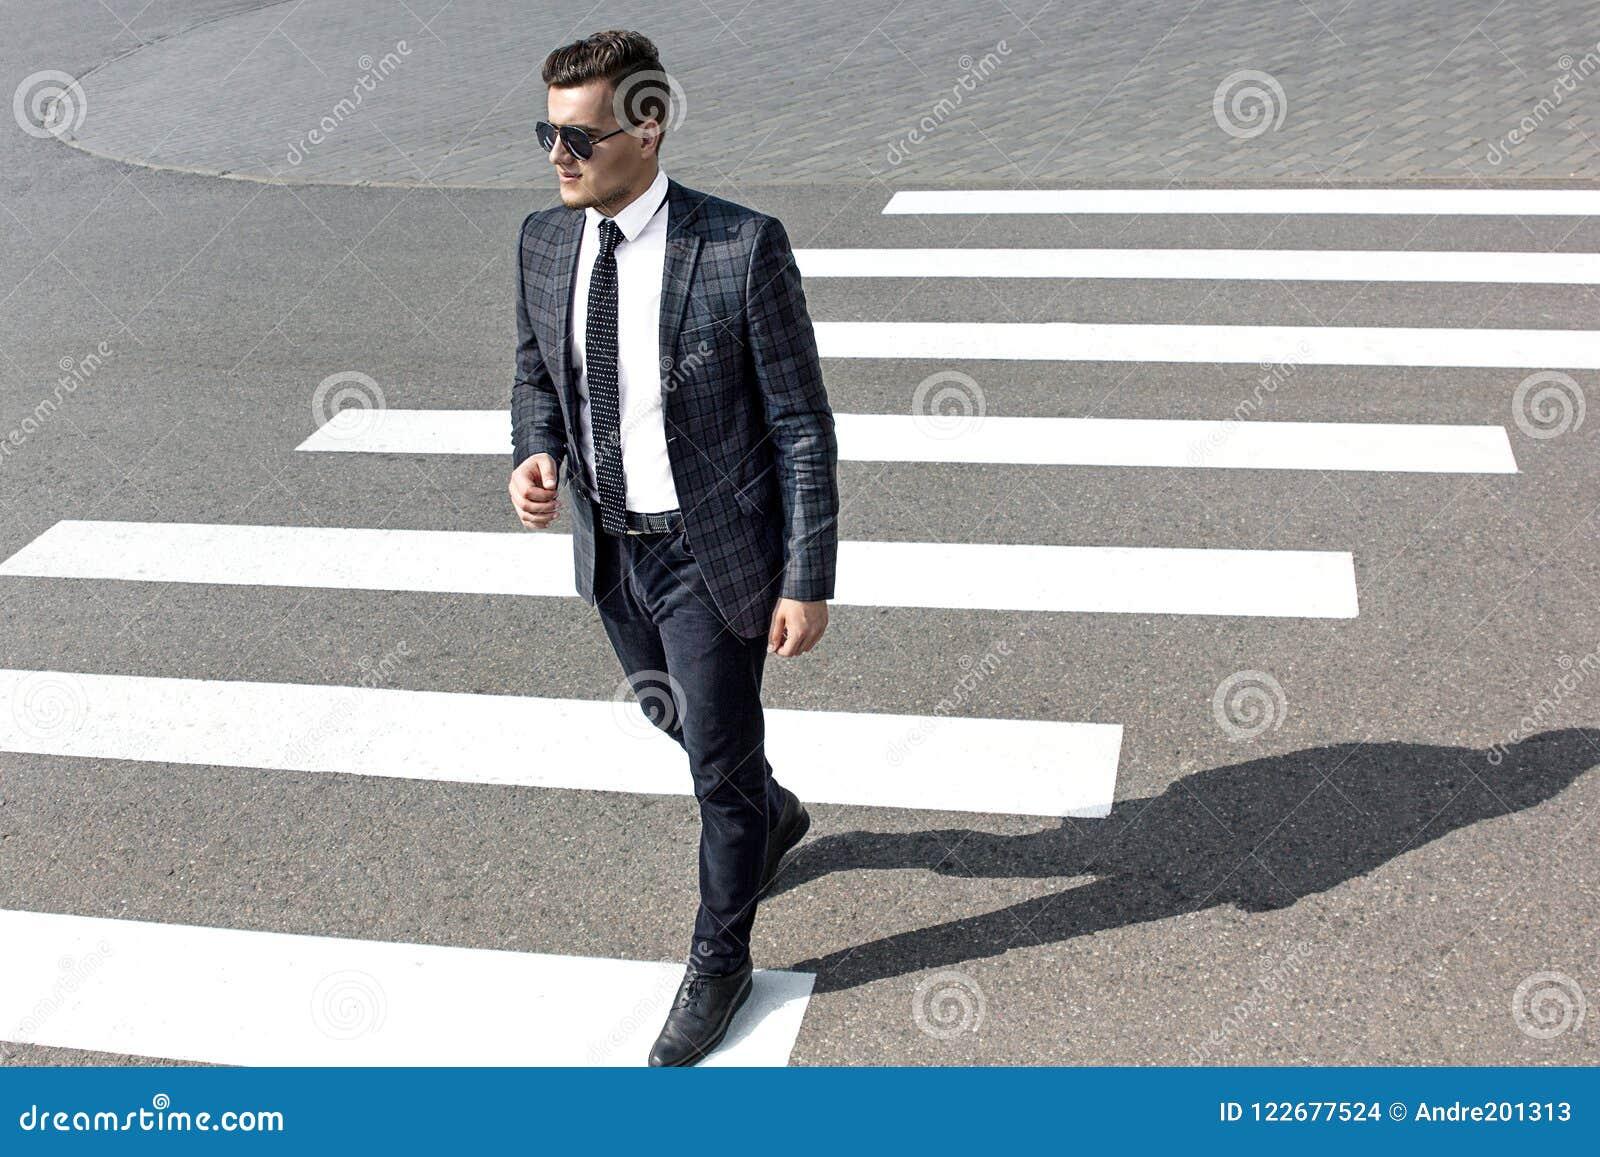 El hombre cruza el camino